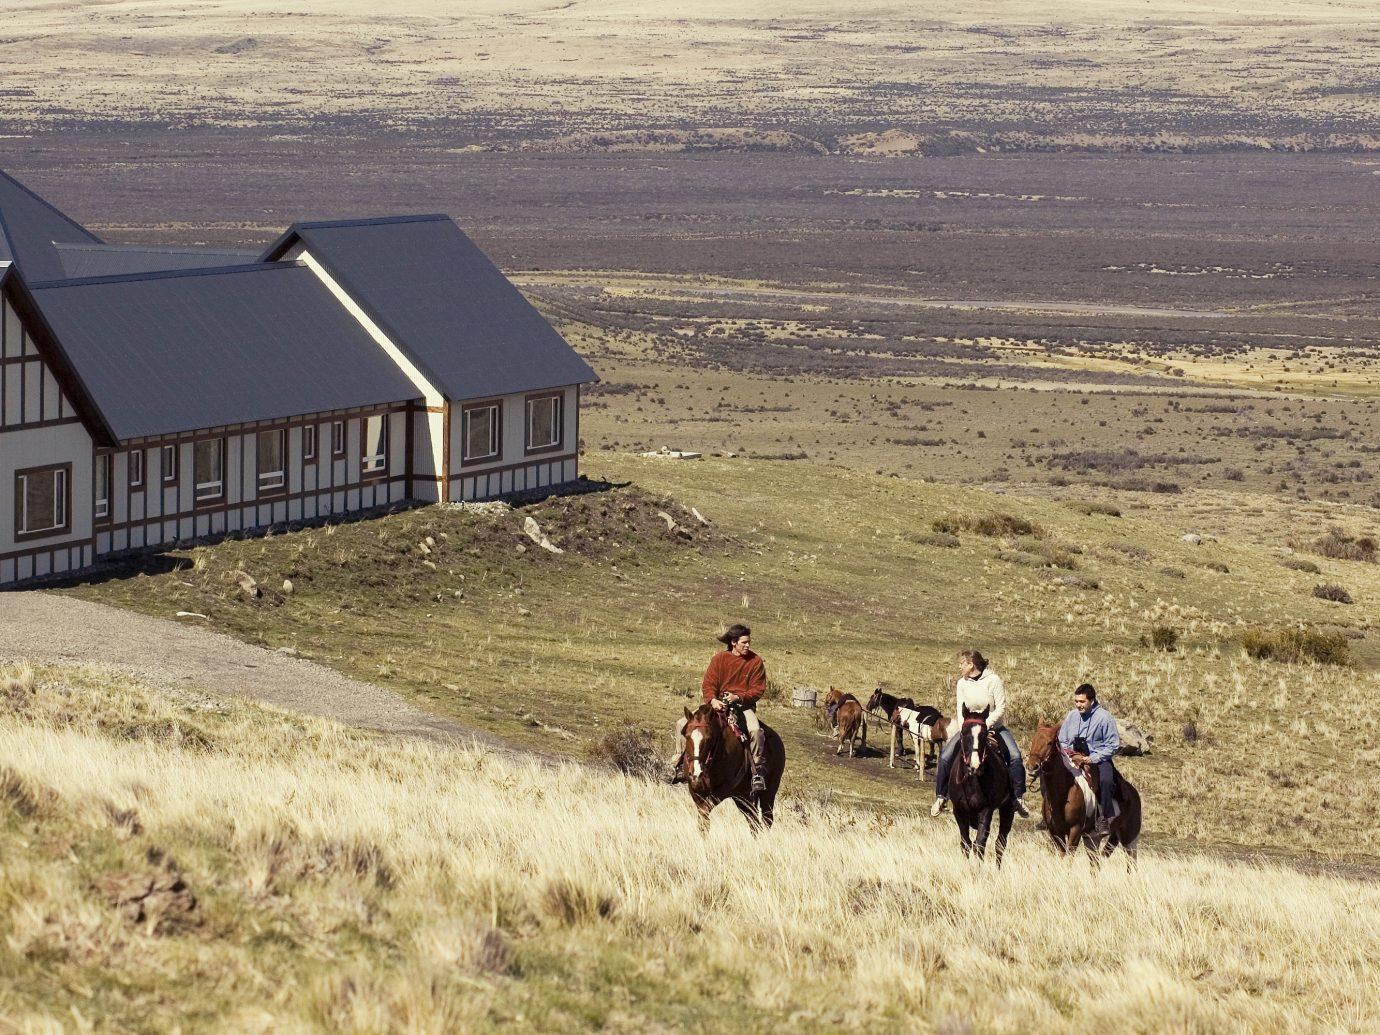 Hotels Outdoors + Adventure grass outdoor field horse prairie rural area Farm landscape agriculture Ranch open horse like mammal farm building barn plain highland